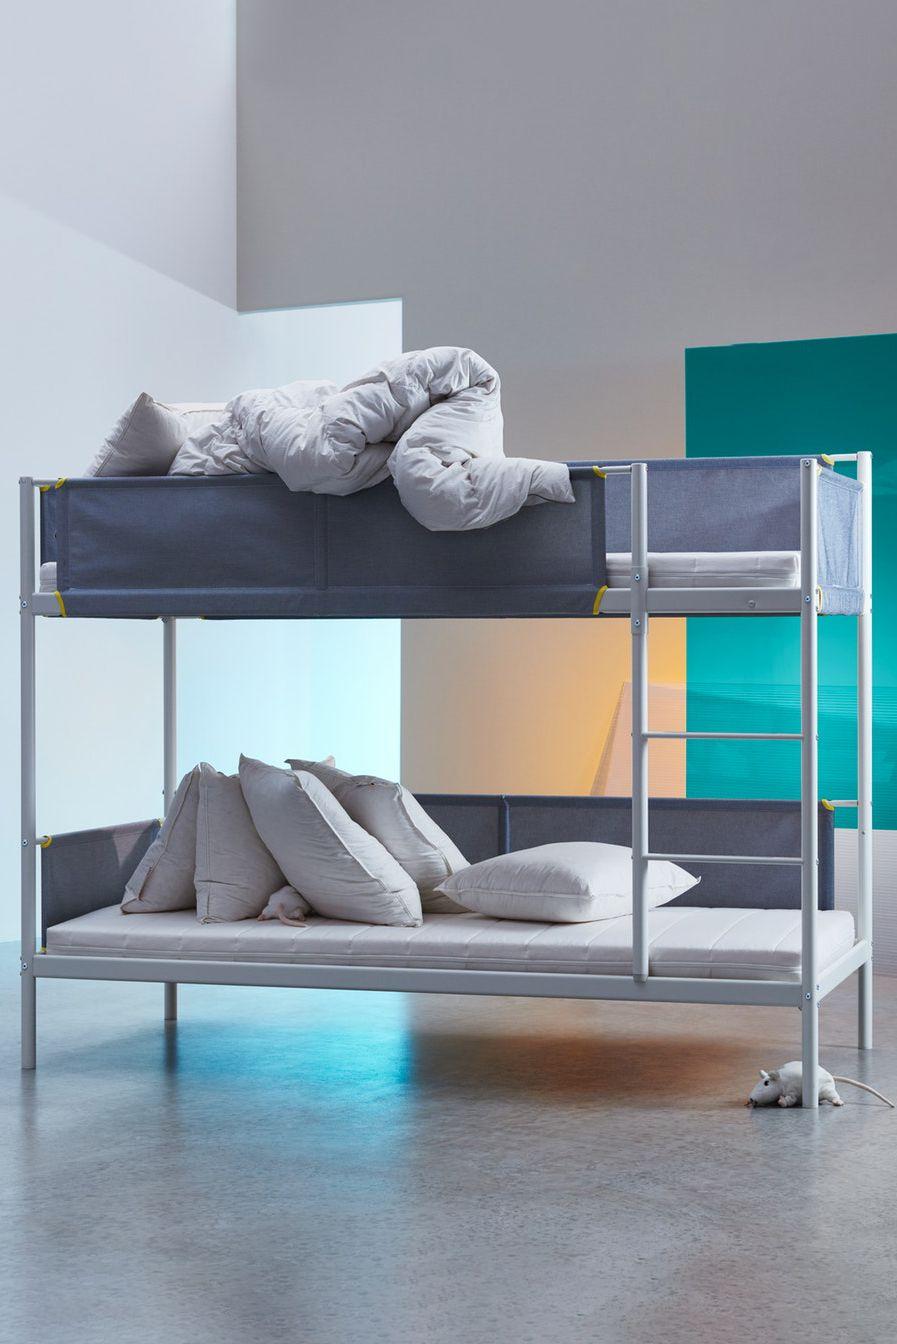 Vitval Etagenbettgestell Weiss Hellgrau Ikea Deutschland Zimmer Ideen Schlafzimmer Bett Ikea